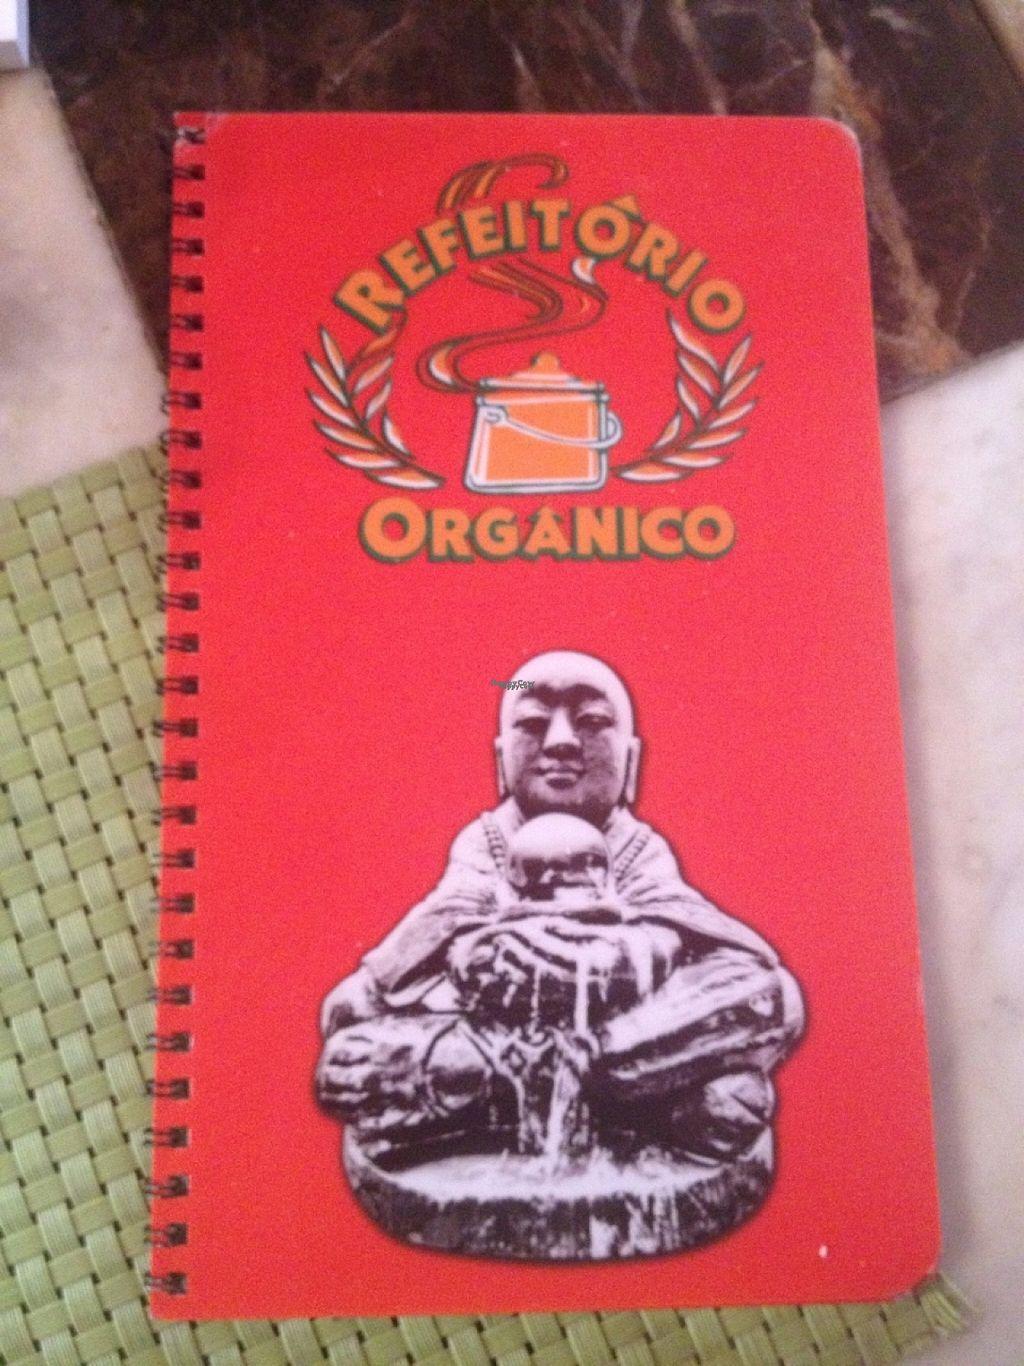 "Photo of Refeitorio Organico  by <a href=""/members/profile/vegan_ryan"">vegan_ryan</a> <br/>Menu <br/> October 29, 2016  - <a href='/contact/abuse/image/19852/185876'>Report</a>"